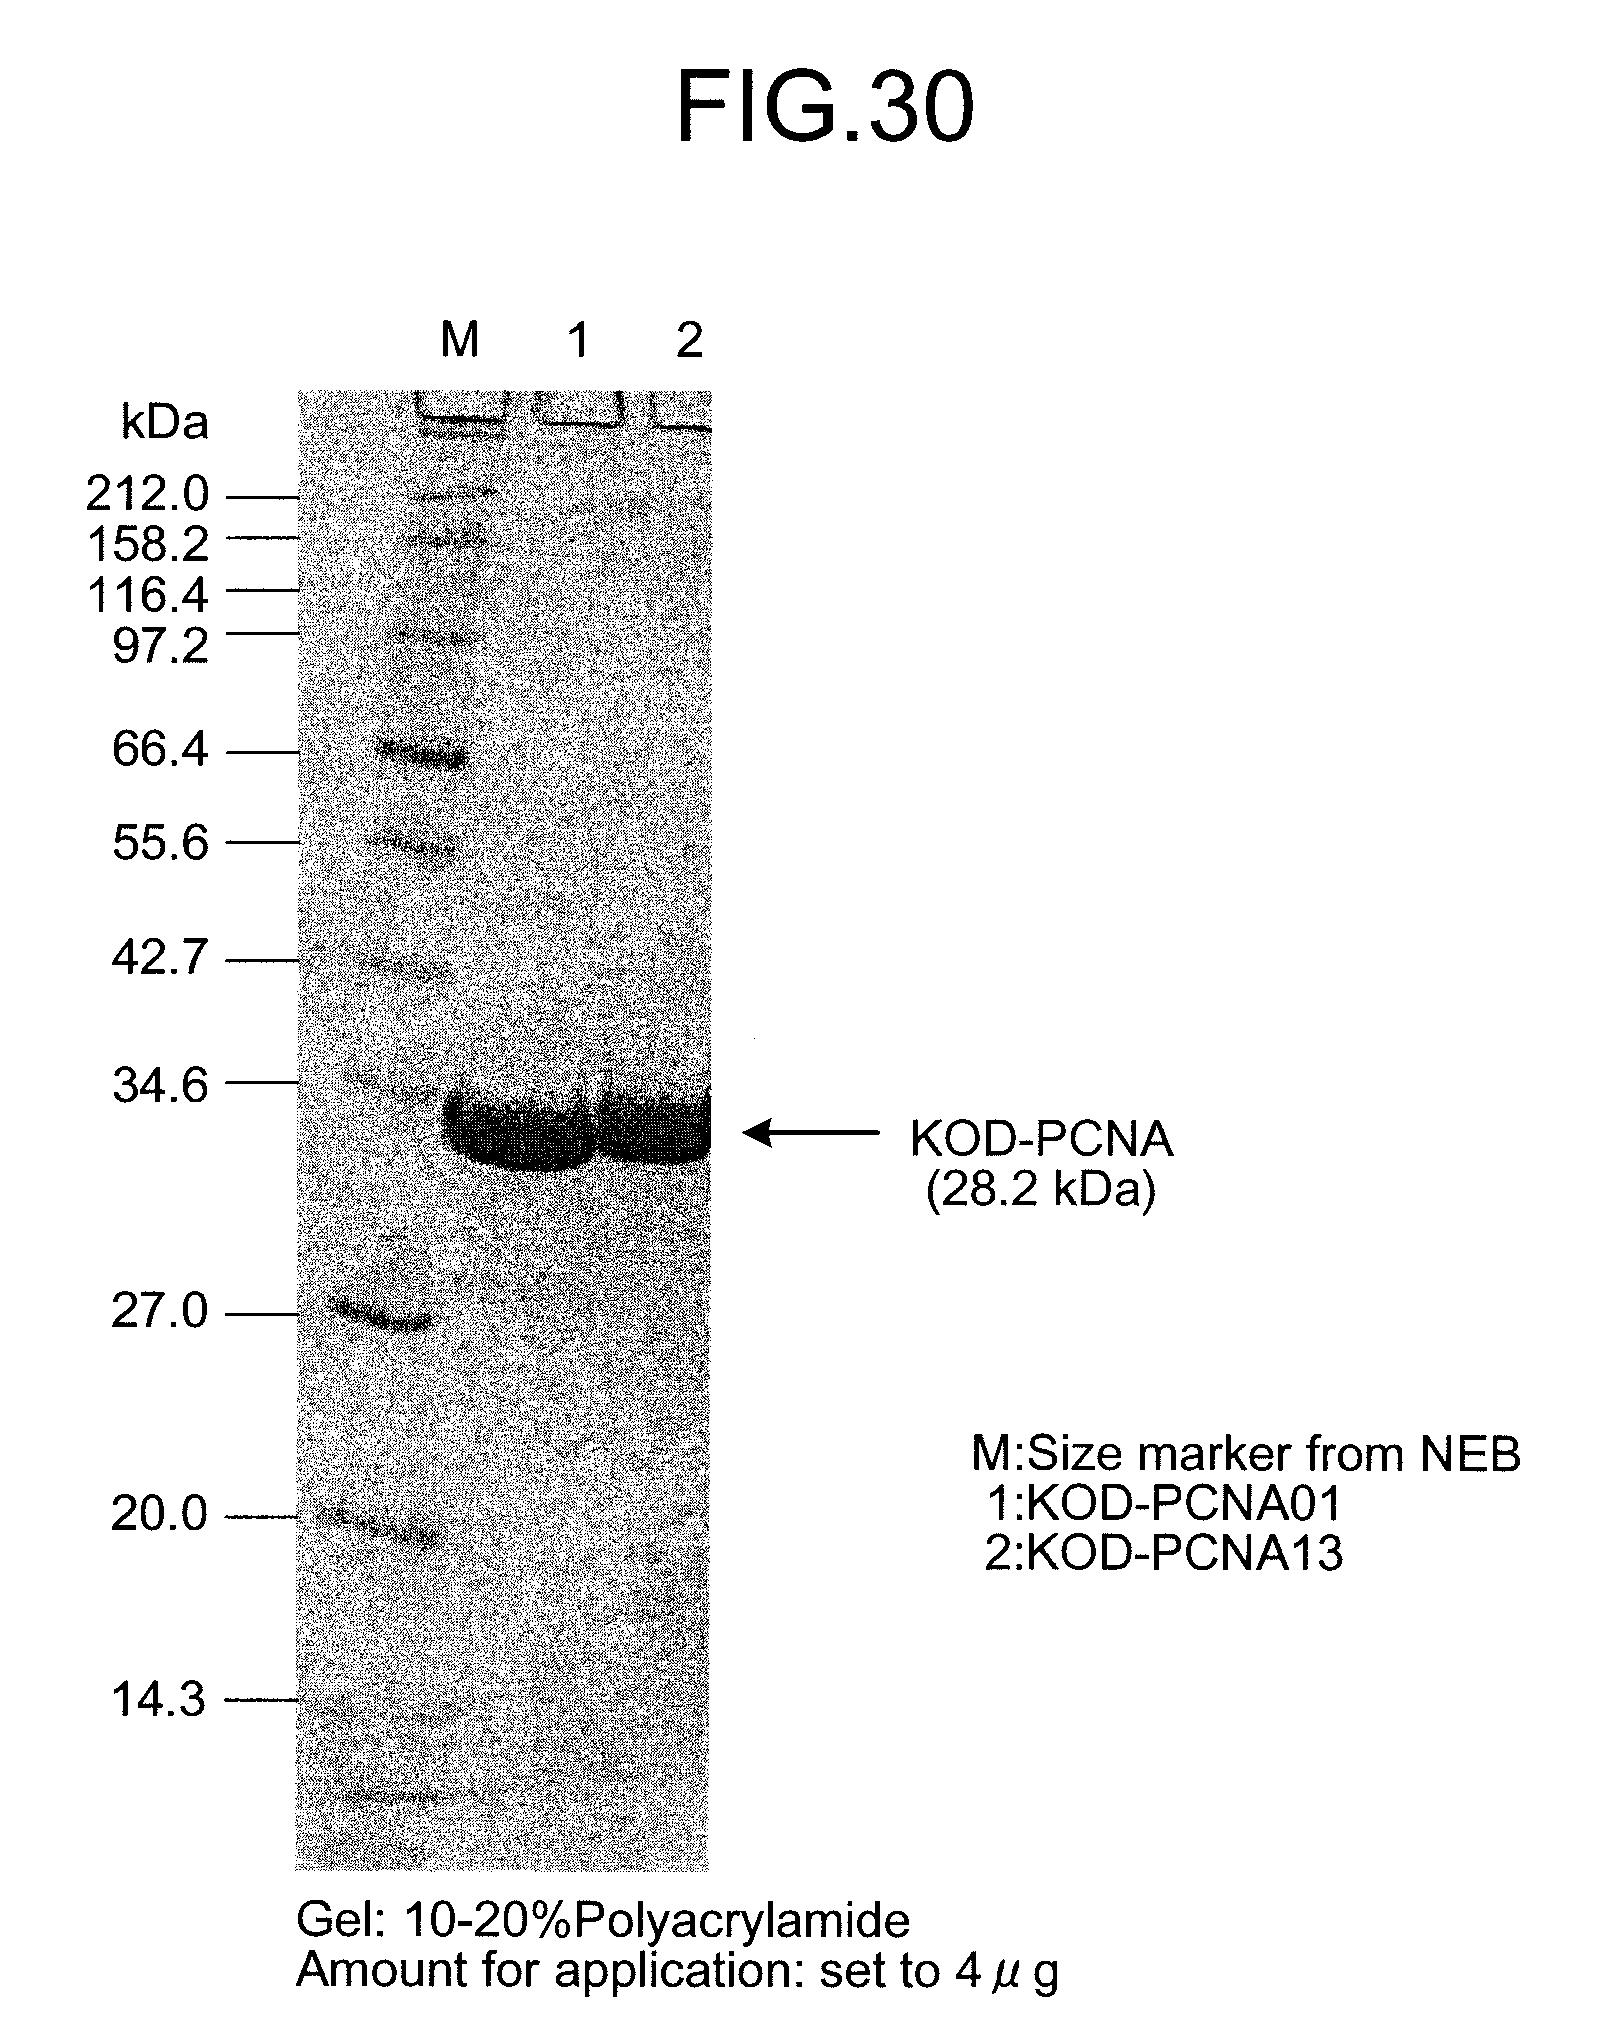 US8003346B2 - Mutant PCNA - Google Patents